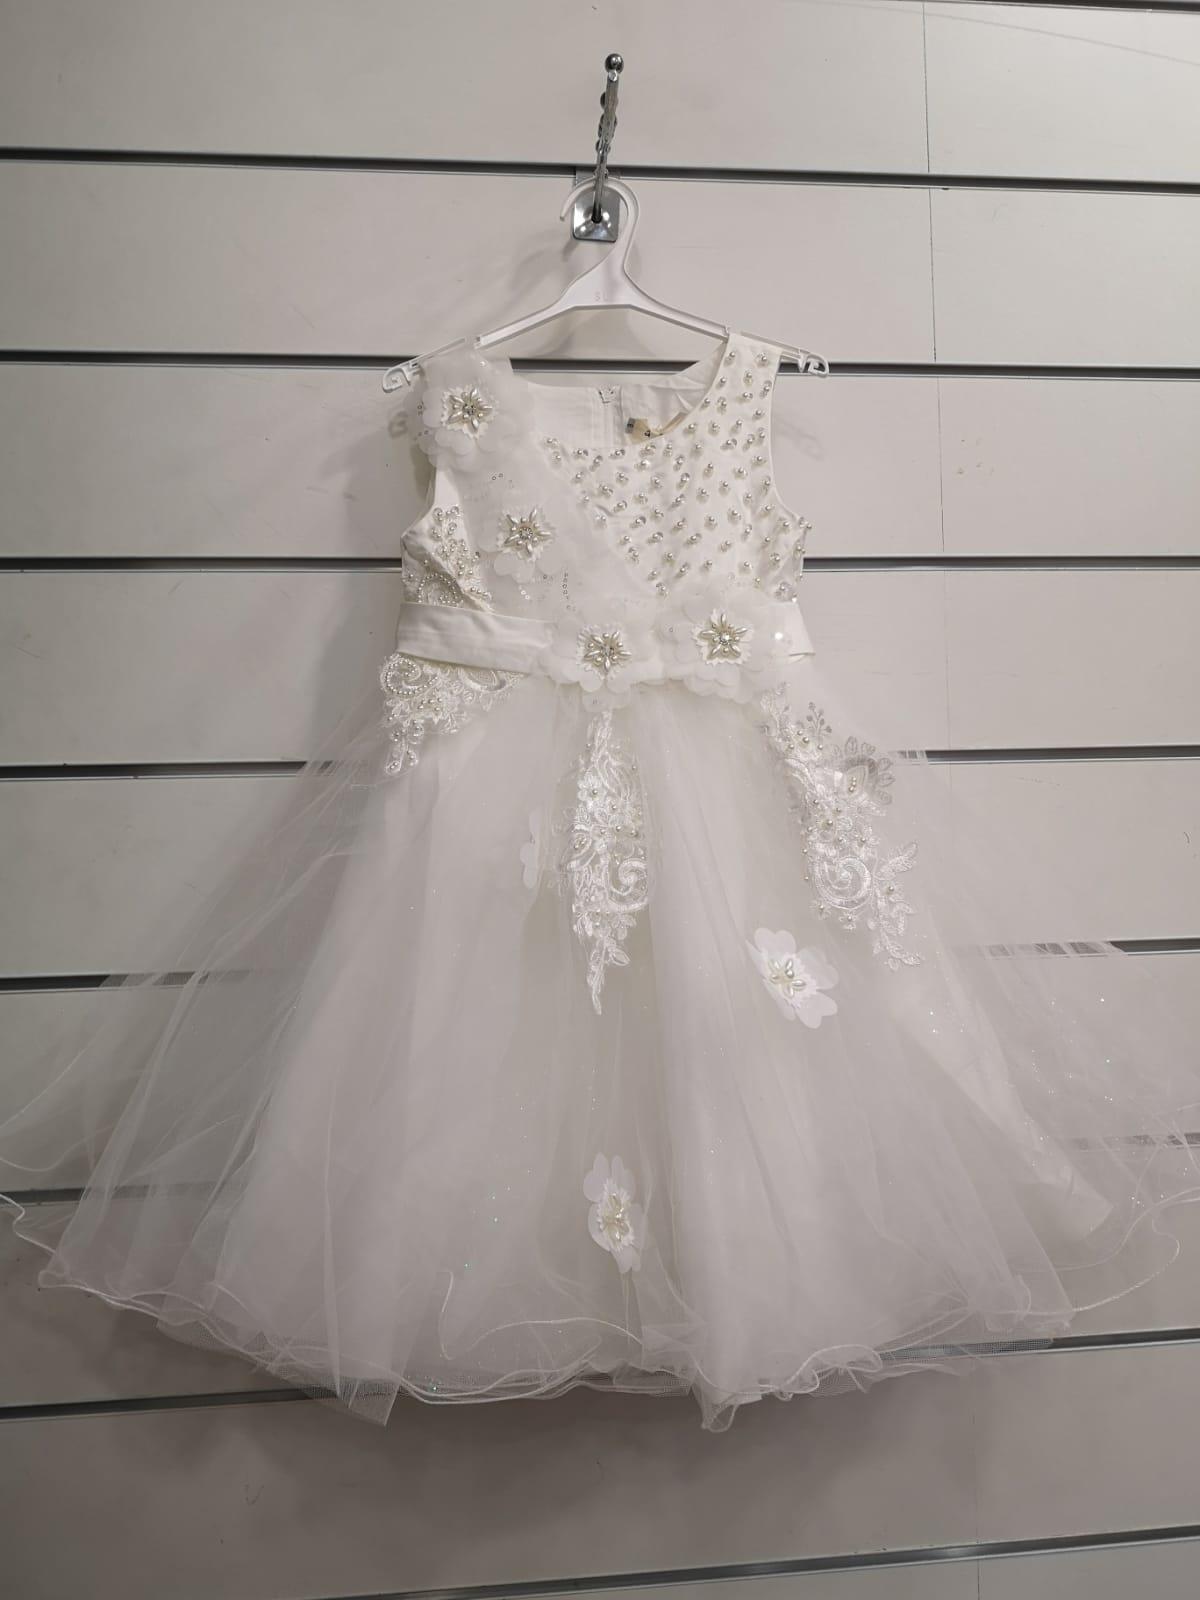 Robes Enfant Blanc pretty baby 98578 #c eFashion Paris